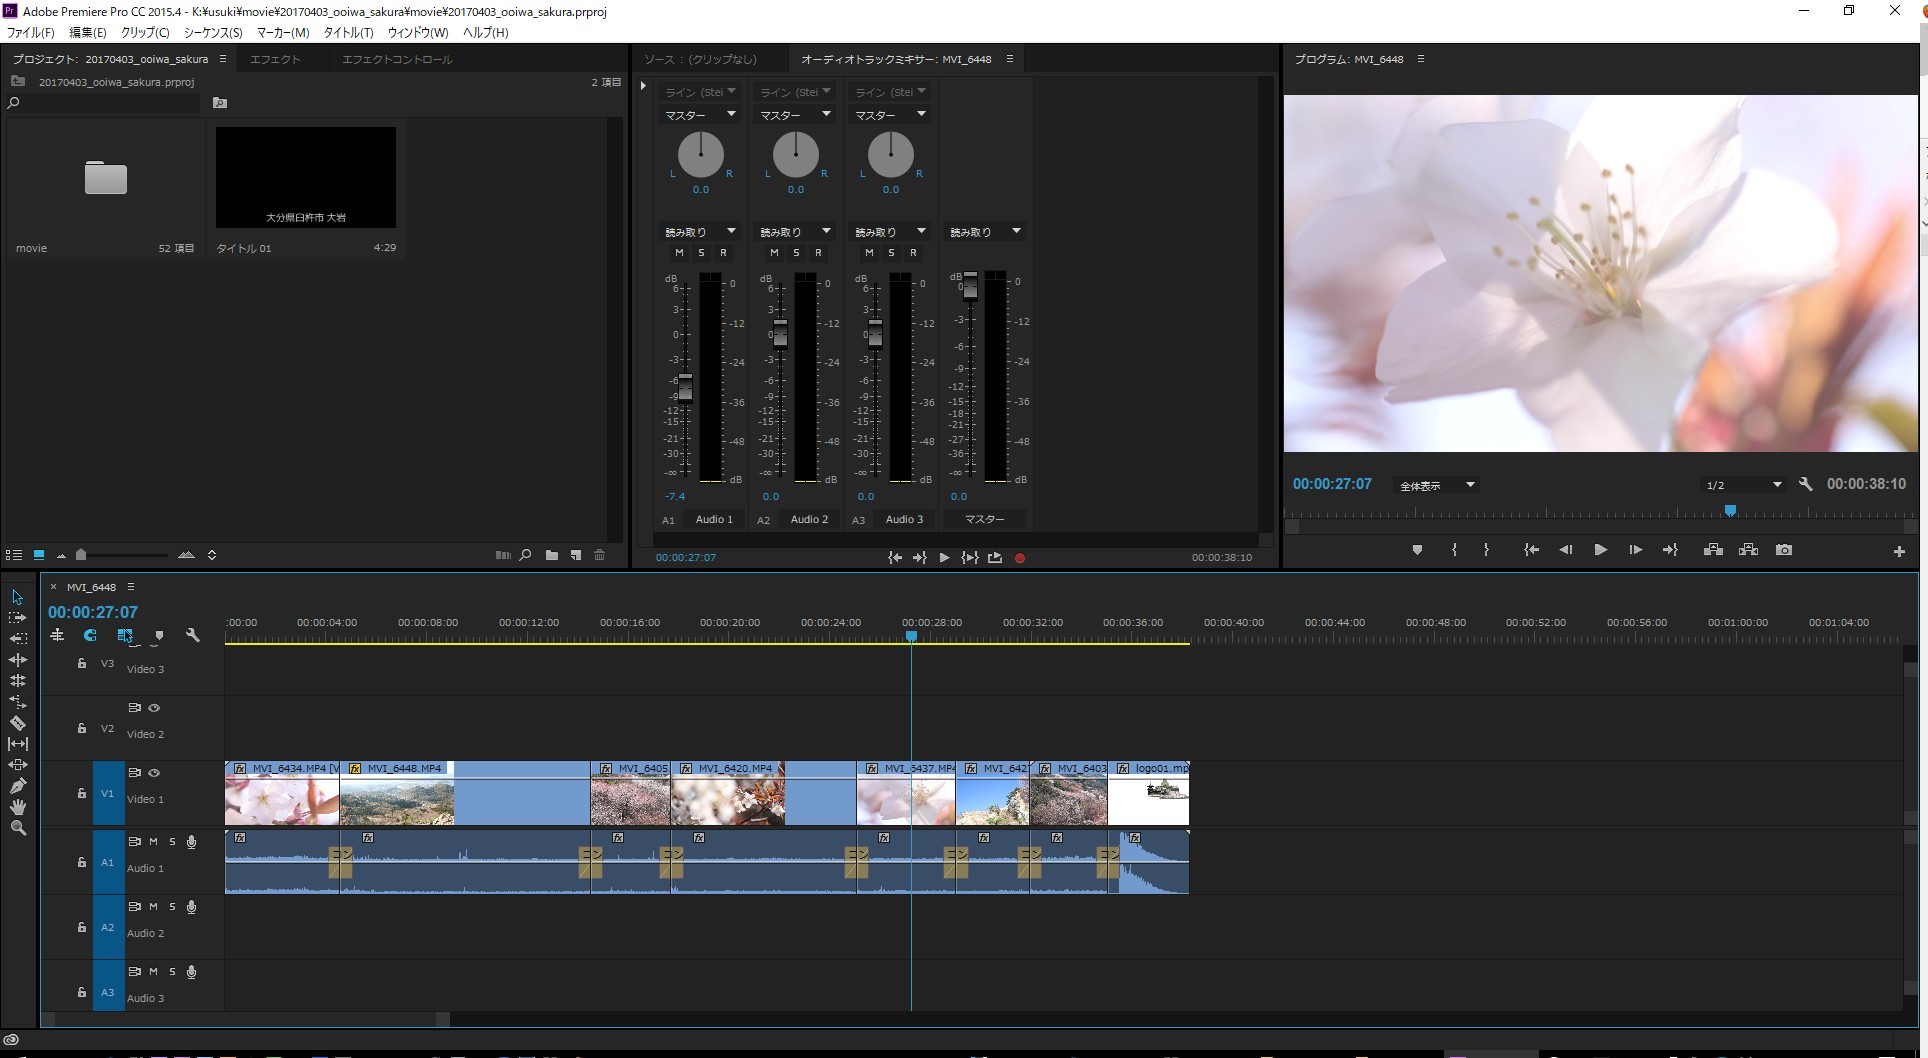 Adobe Premiere CCインターフェイス